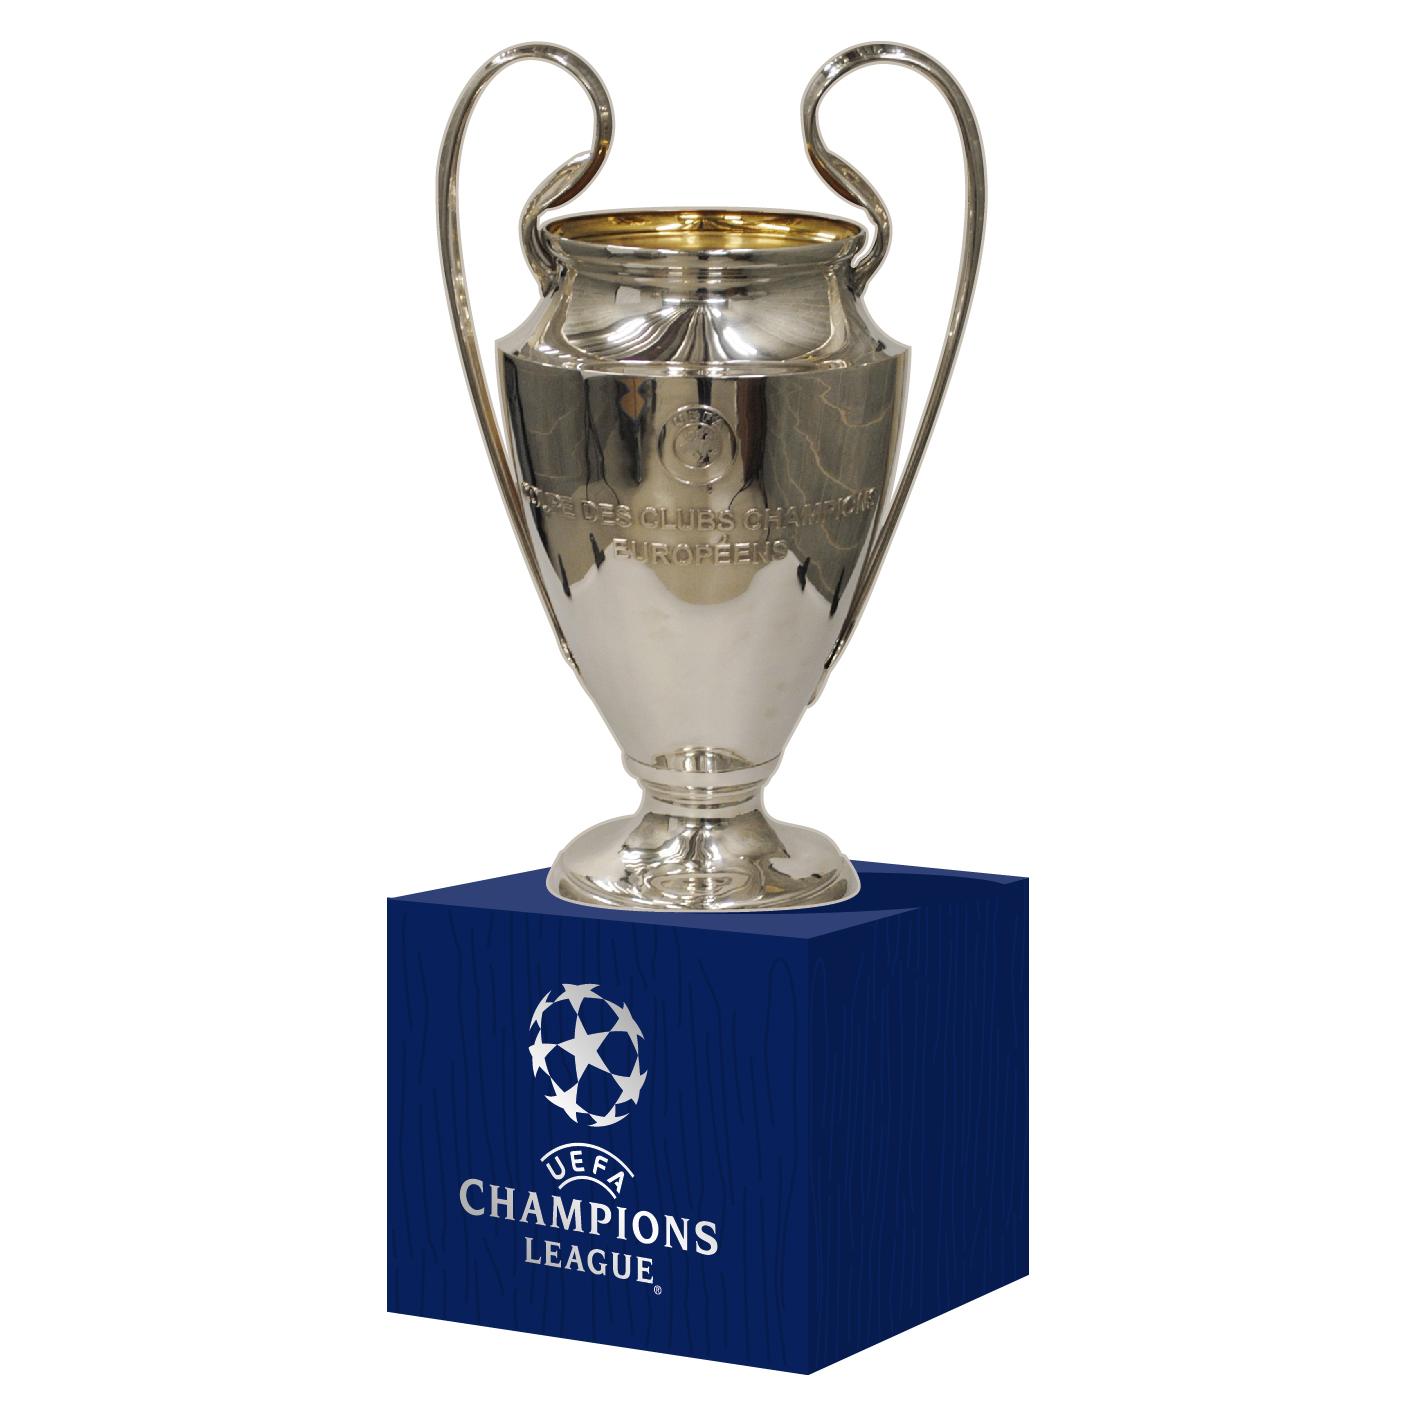 UEFA Champions League Trophy 70mm on Wooden Pedestal